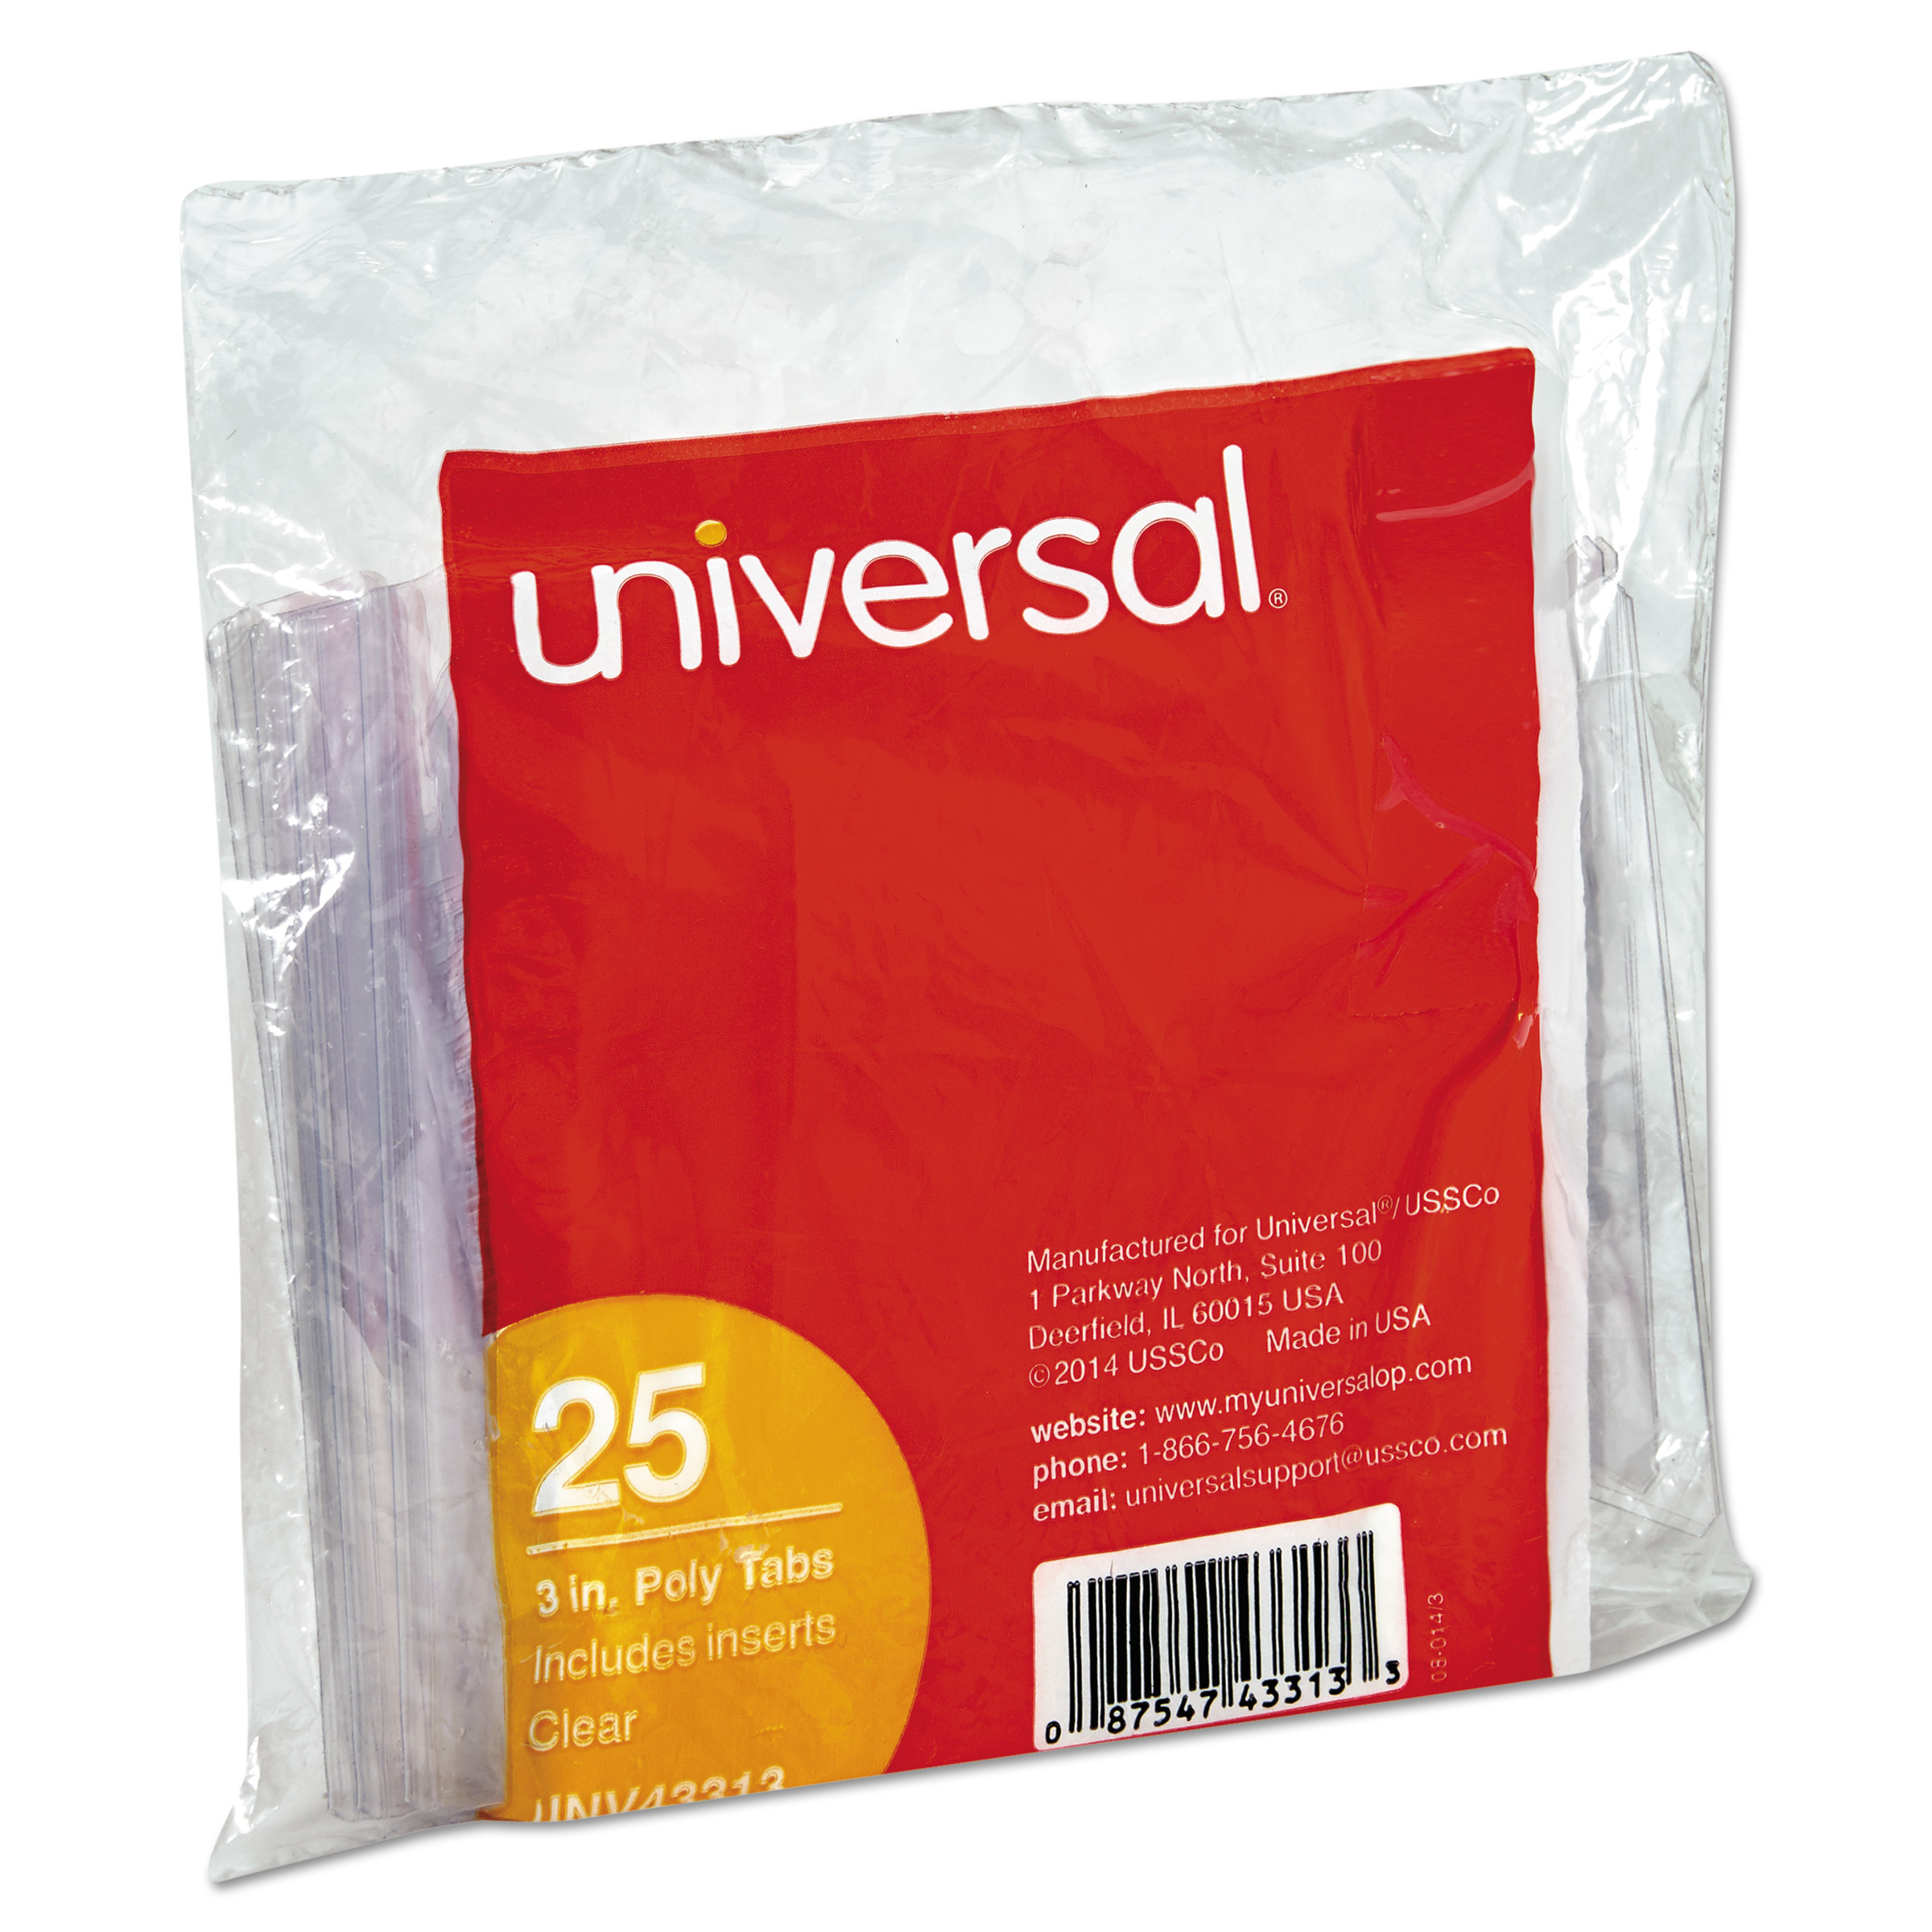 "Universal Hanging File Folder Plastic Index Tabs, 1/3 Tab Cut, 3 1/2"" Tab, Clear, 25/Pack"